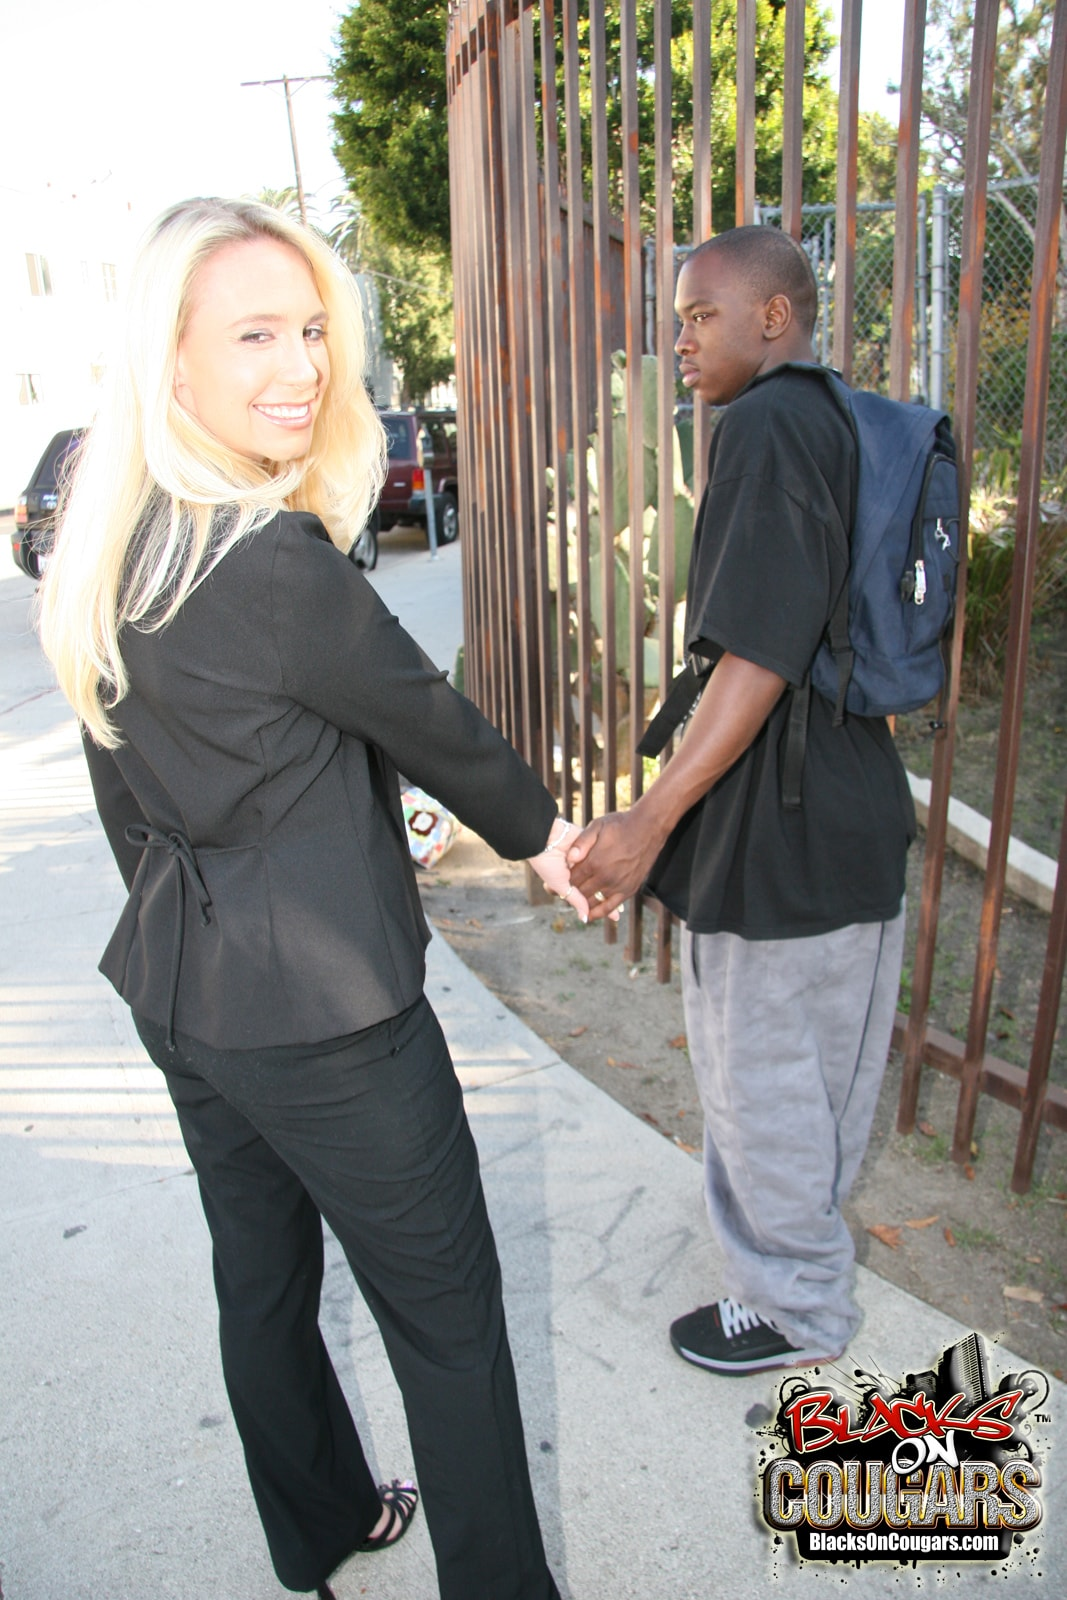 Dogfart '- Blacks On Cougars' starring Debbie Dial (Photo 4)